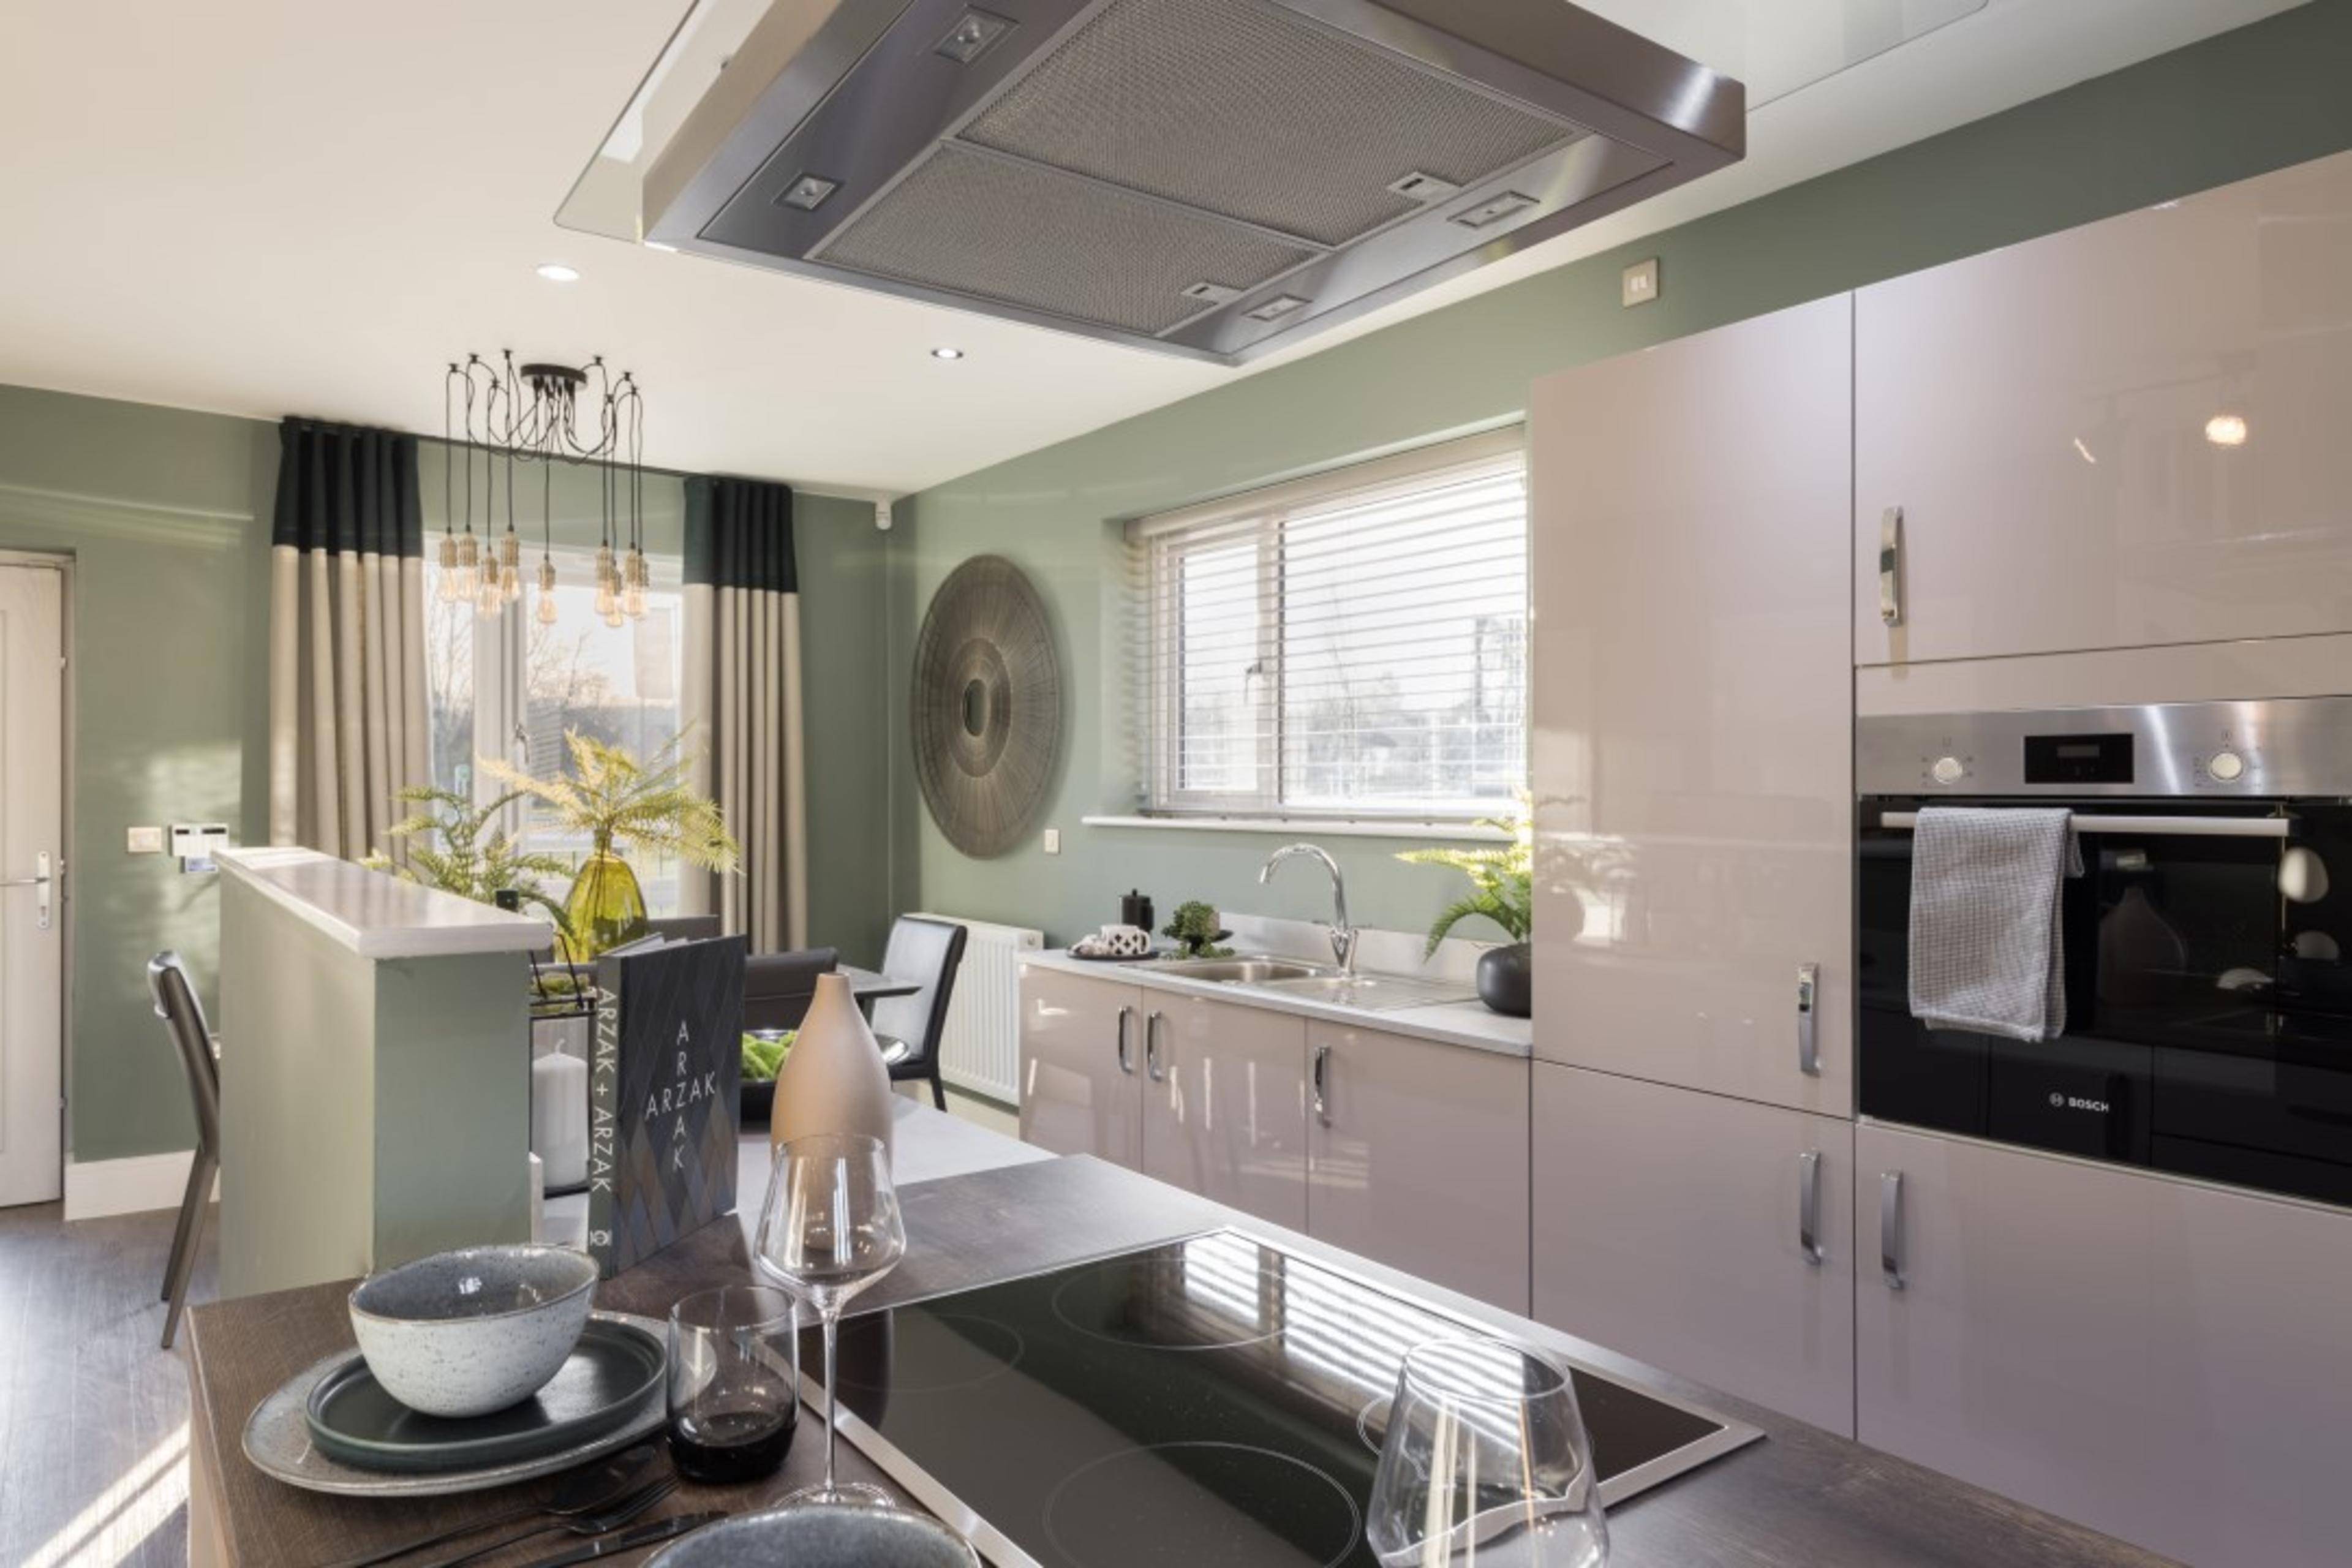 Easby-3-bed-new-build-home-Harrogate-Watling-Grange-kitchen-2